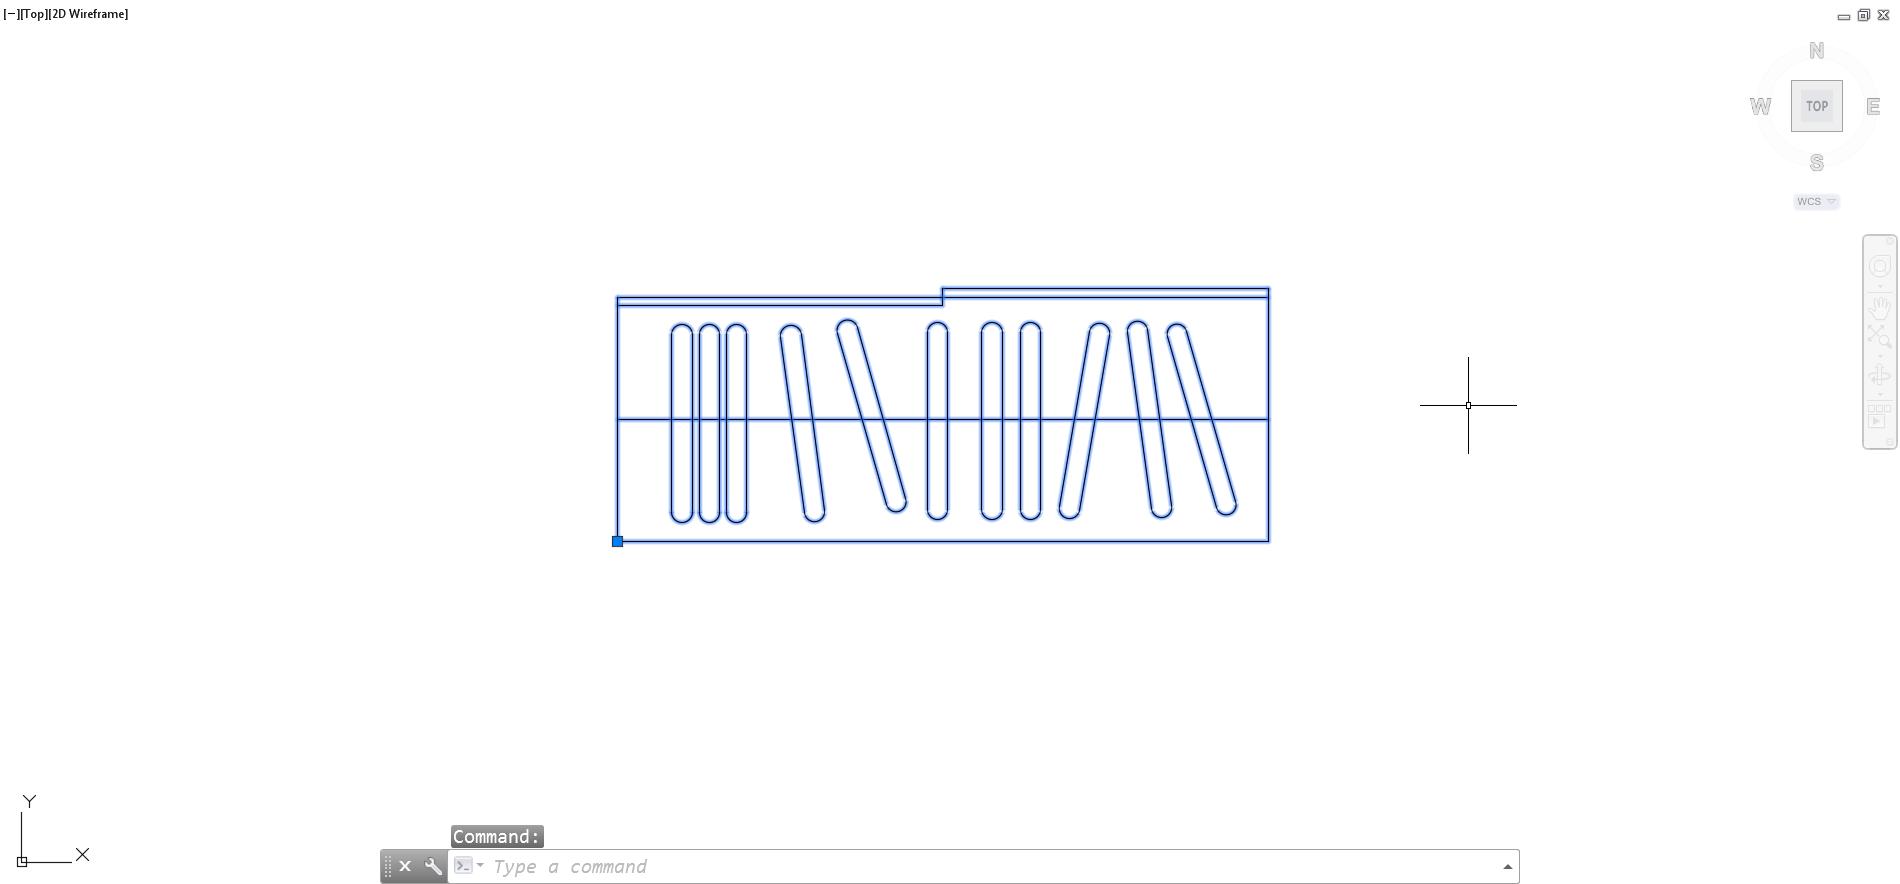 AutoCAD Training Article - Ch 4 - Screenshot 4